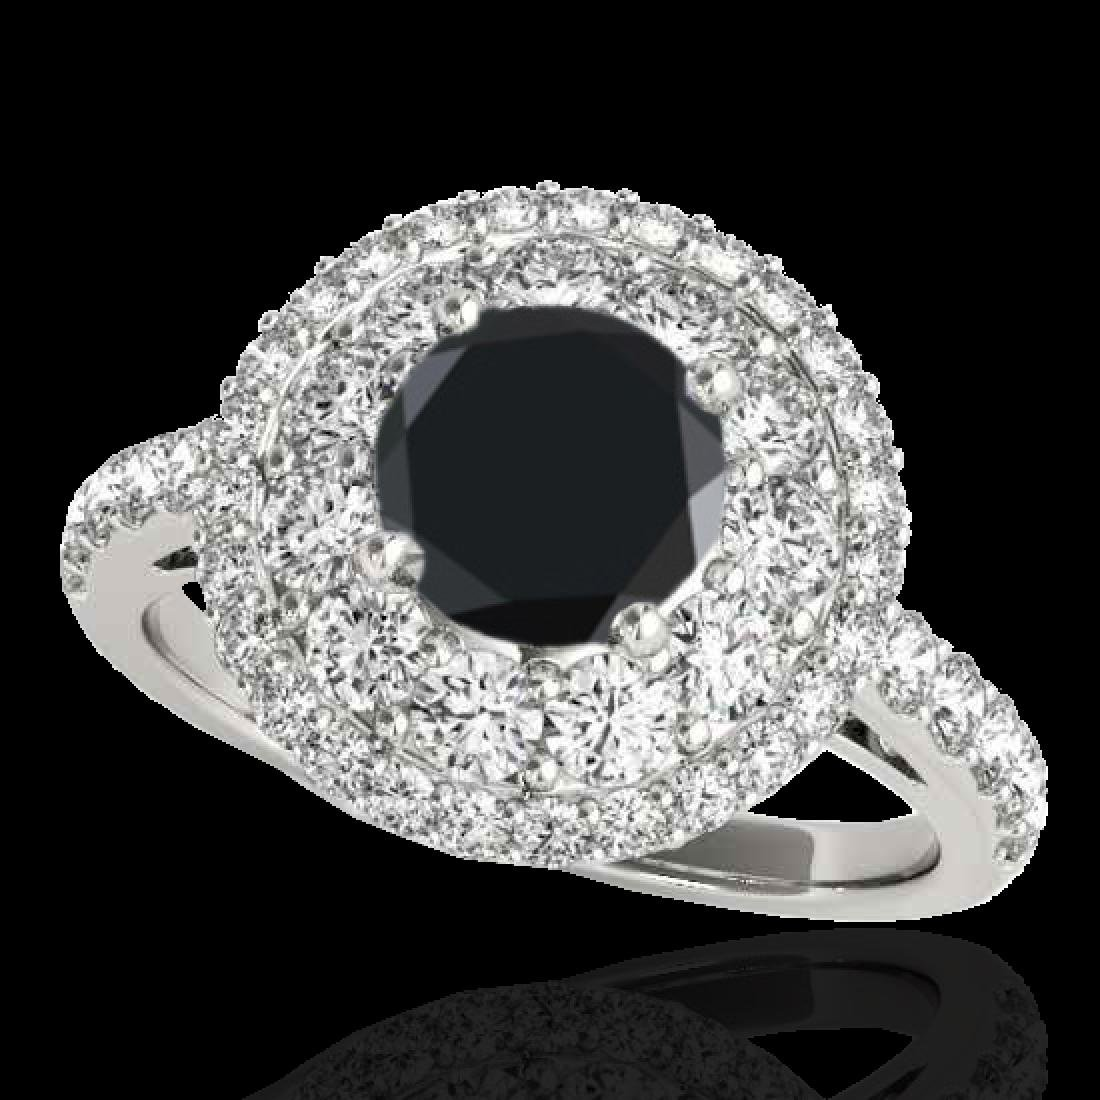 2.09 CTW Certified VS Black Diamond Solitaire Halo Ring